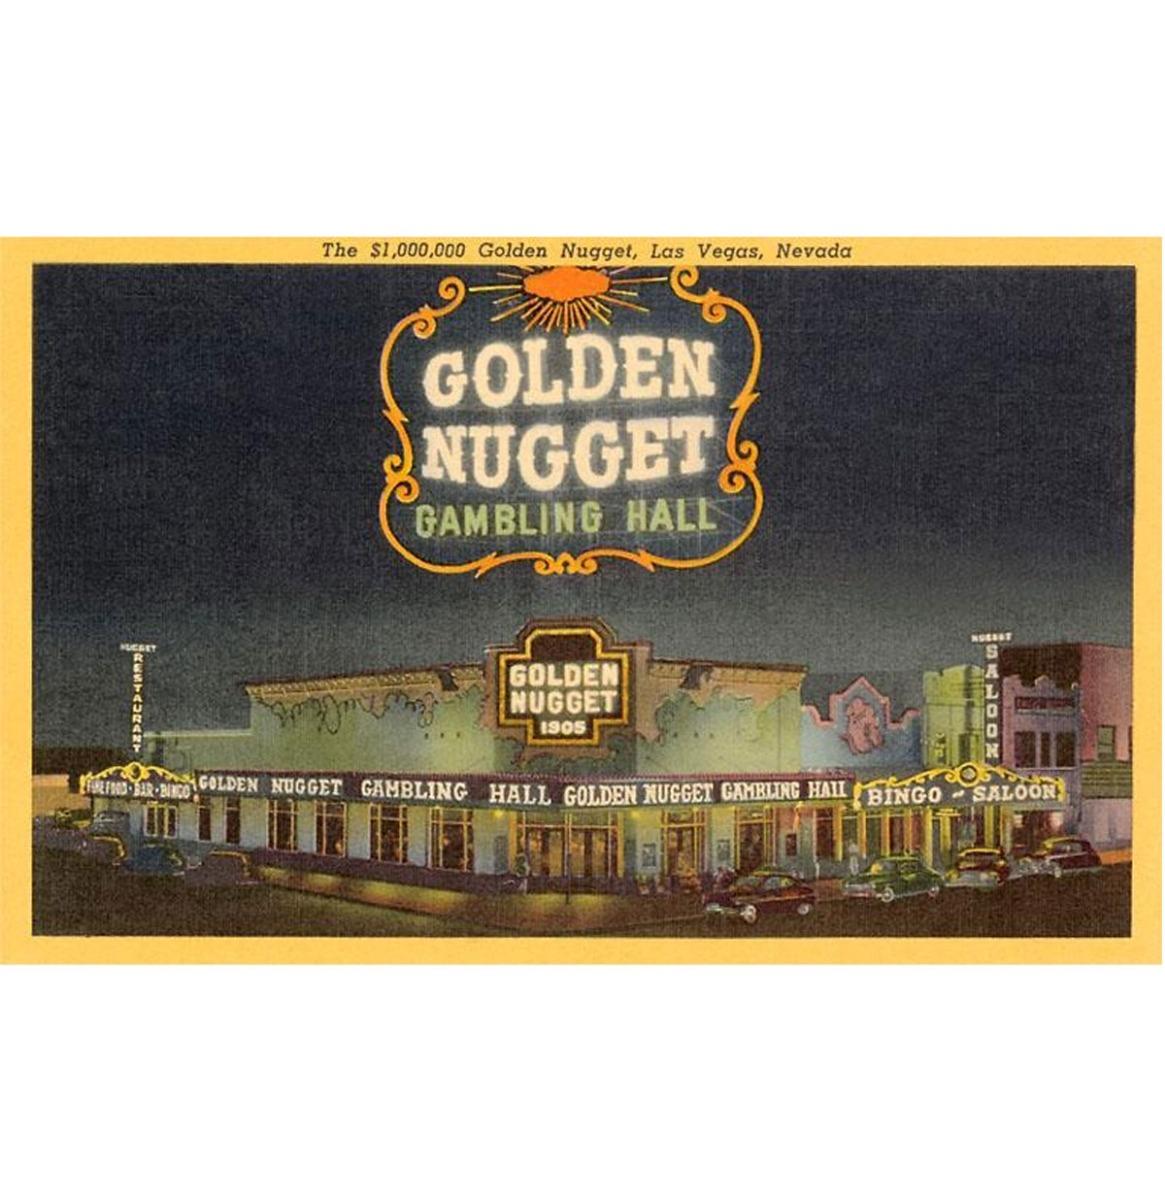 Golden Nugget Gambling Hall, Las Vegas, Nevada - Vintage Foto, Kunst Afdruk